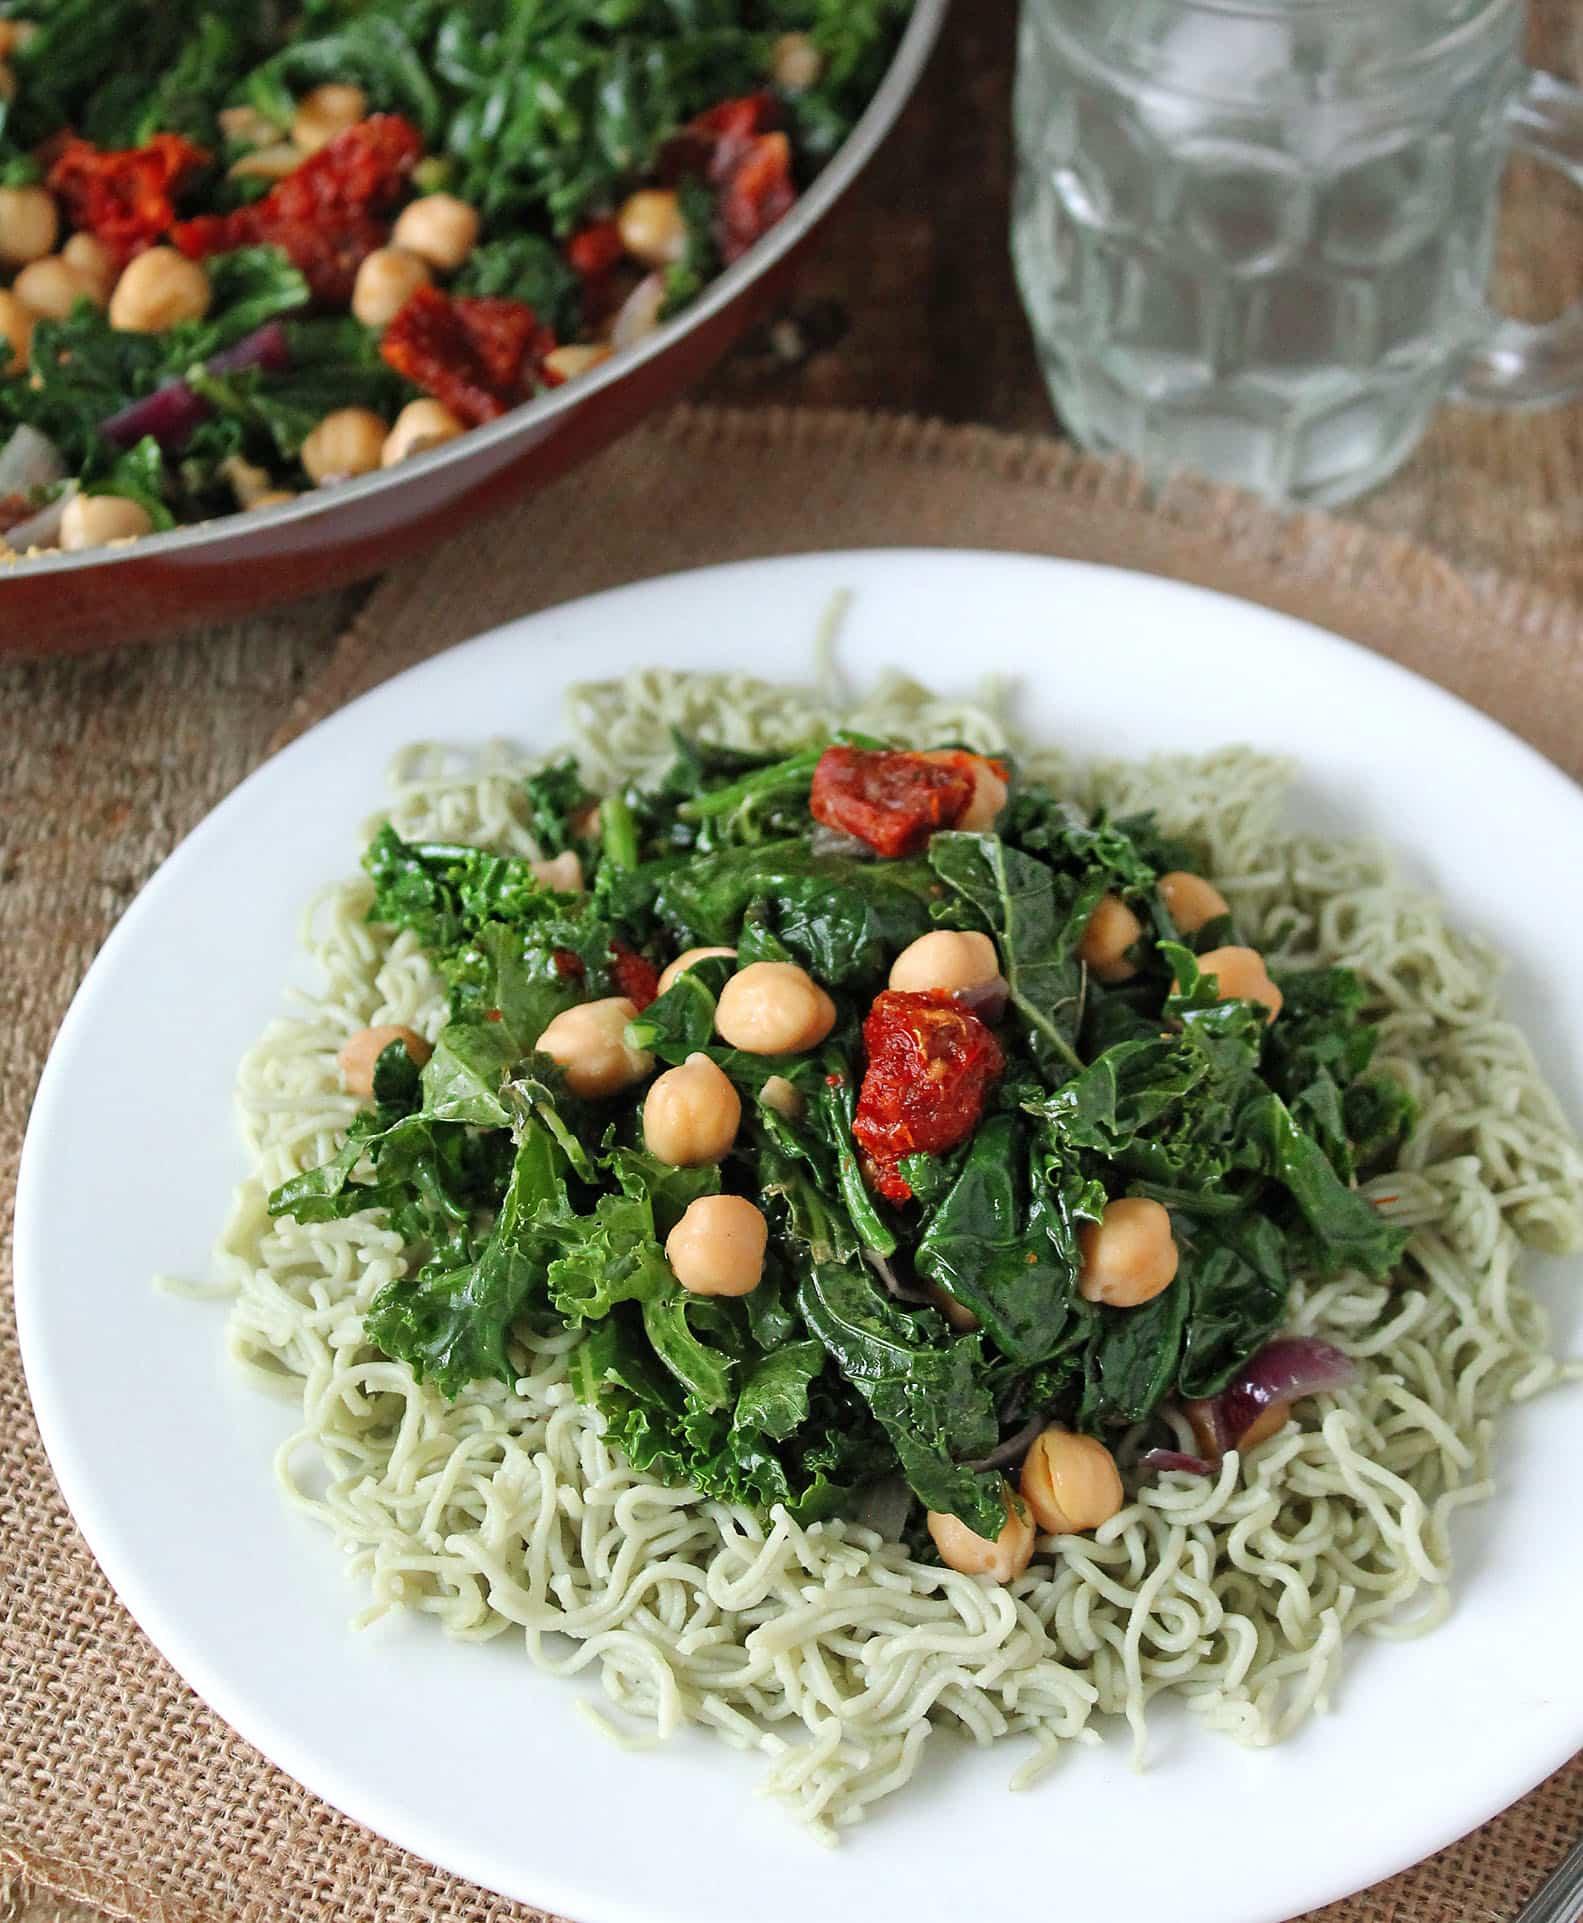 Kale-Sundried-Tomato-Chickpea-Salad-#HeatAndEat